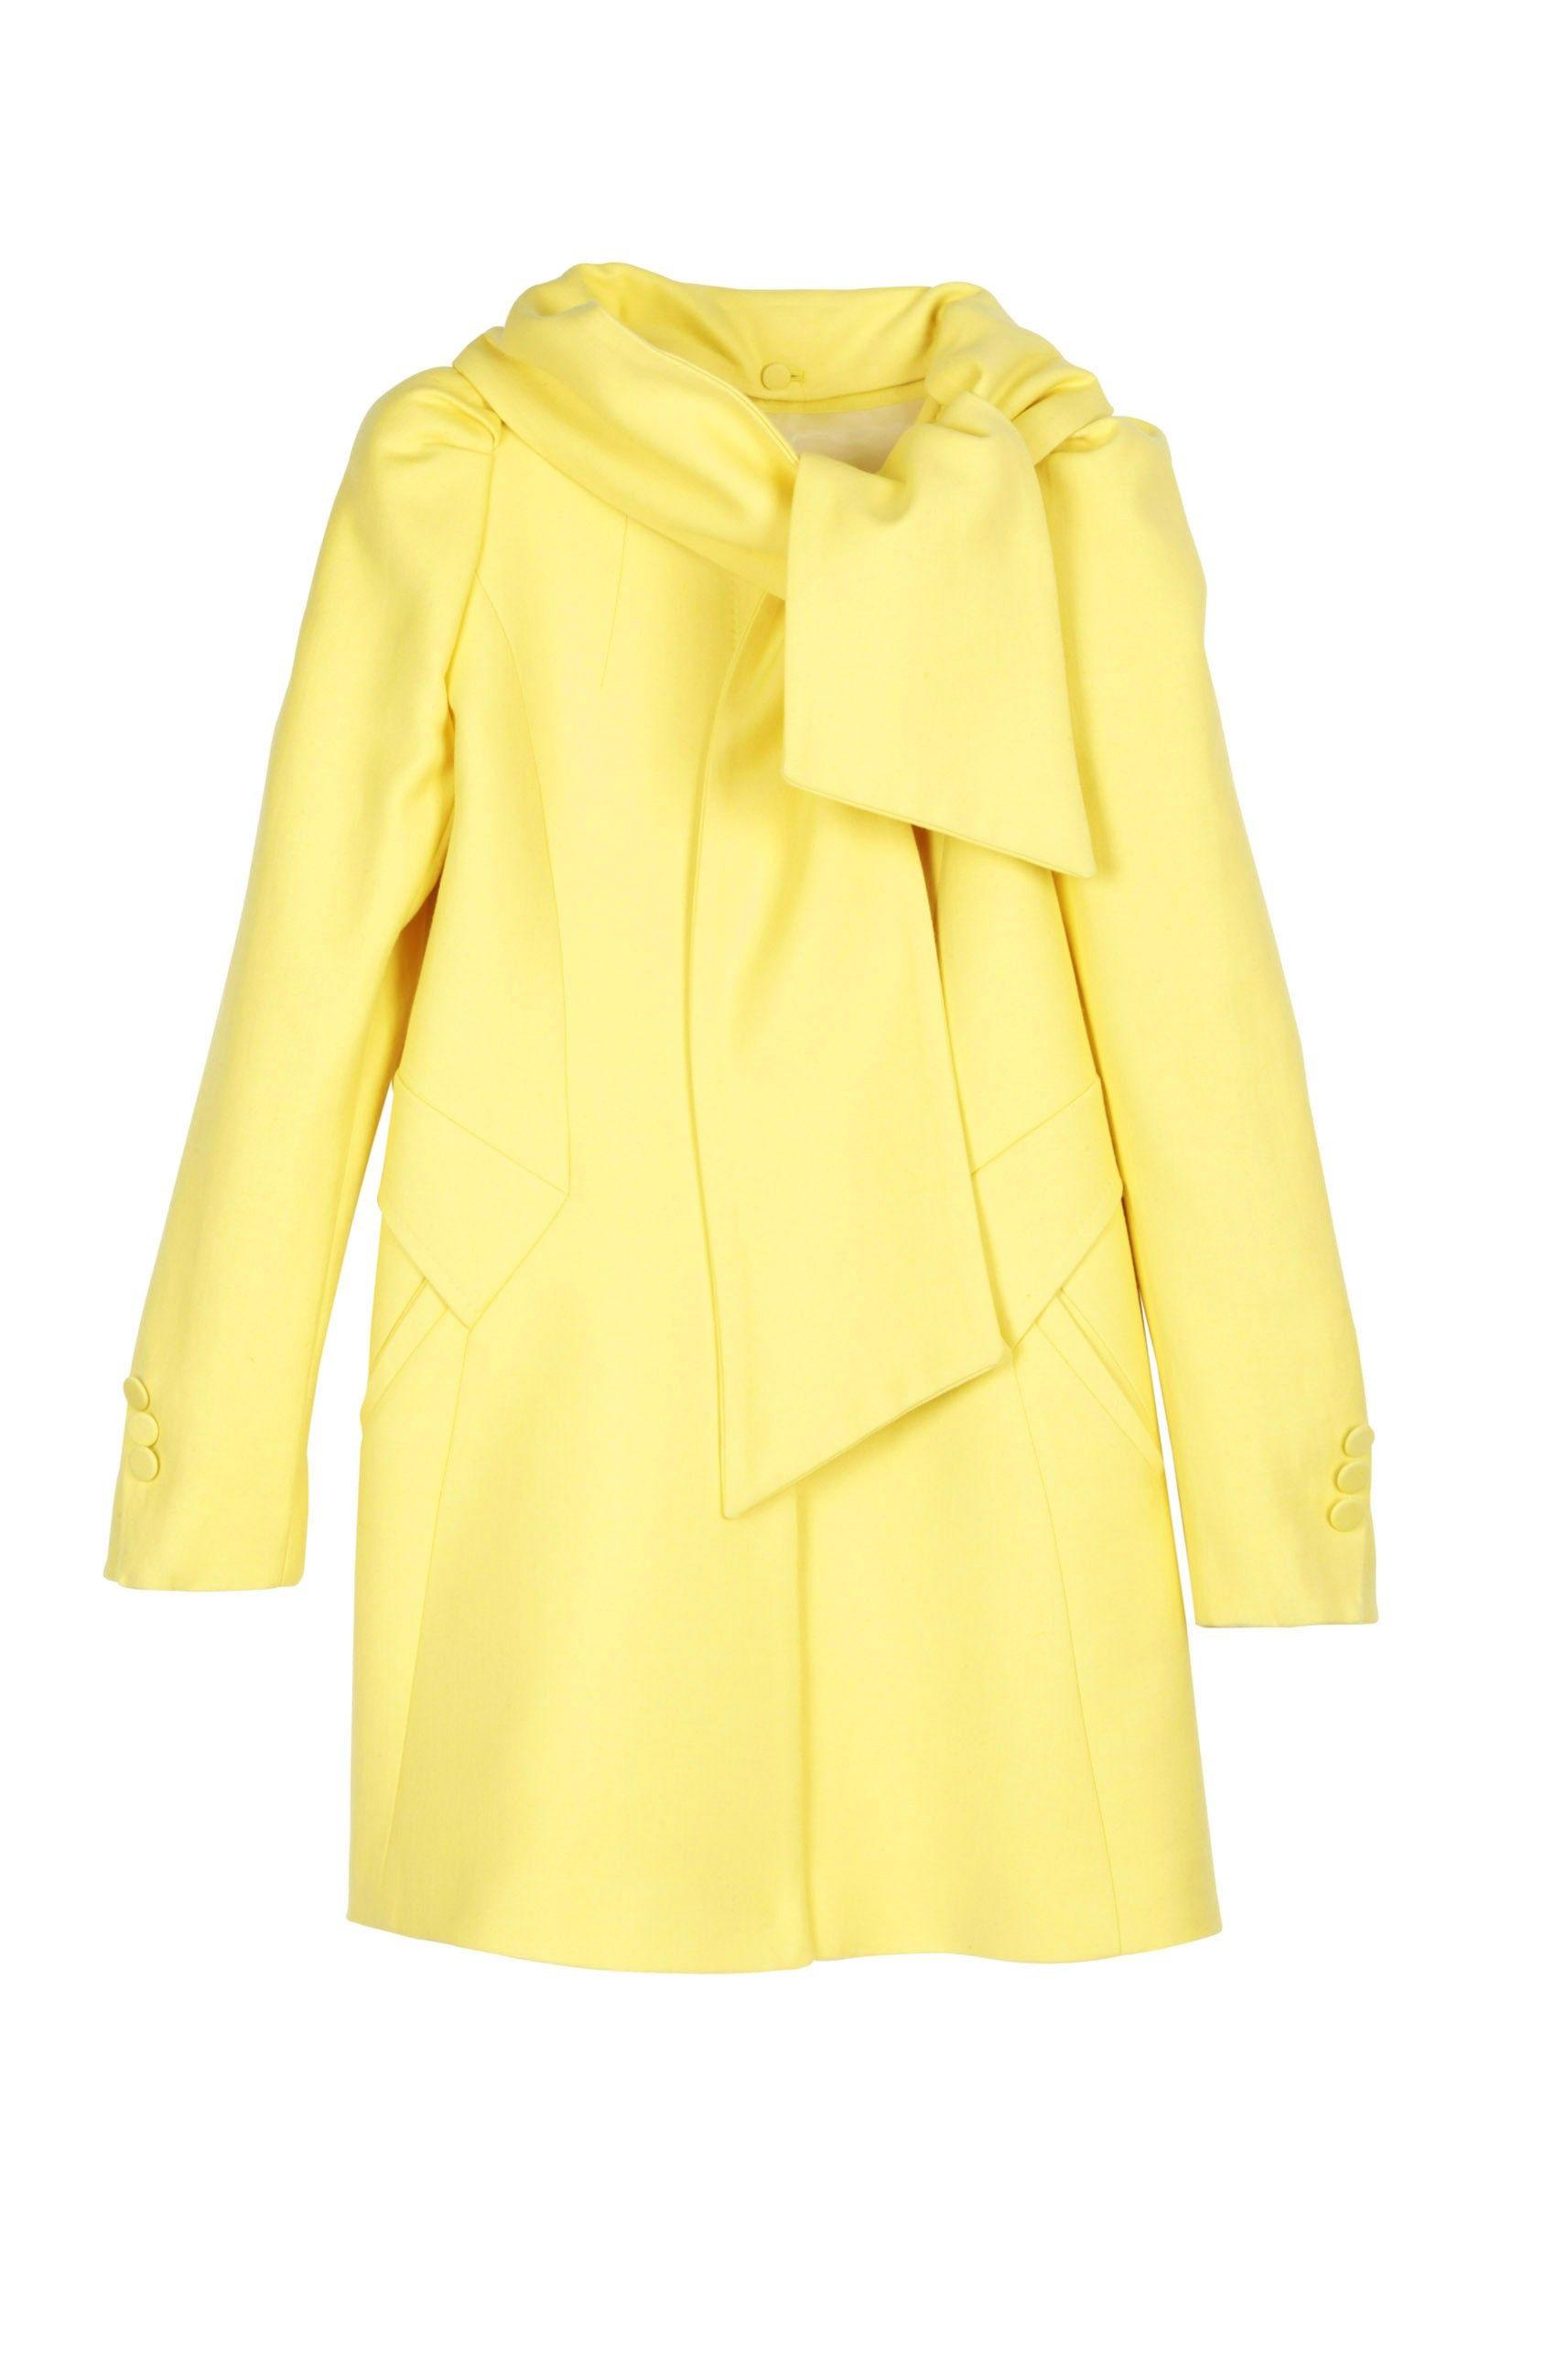 238e38533 Discover ideas about Beige Coat. Buy Ted Baker Zip Front Cape Coat